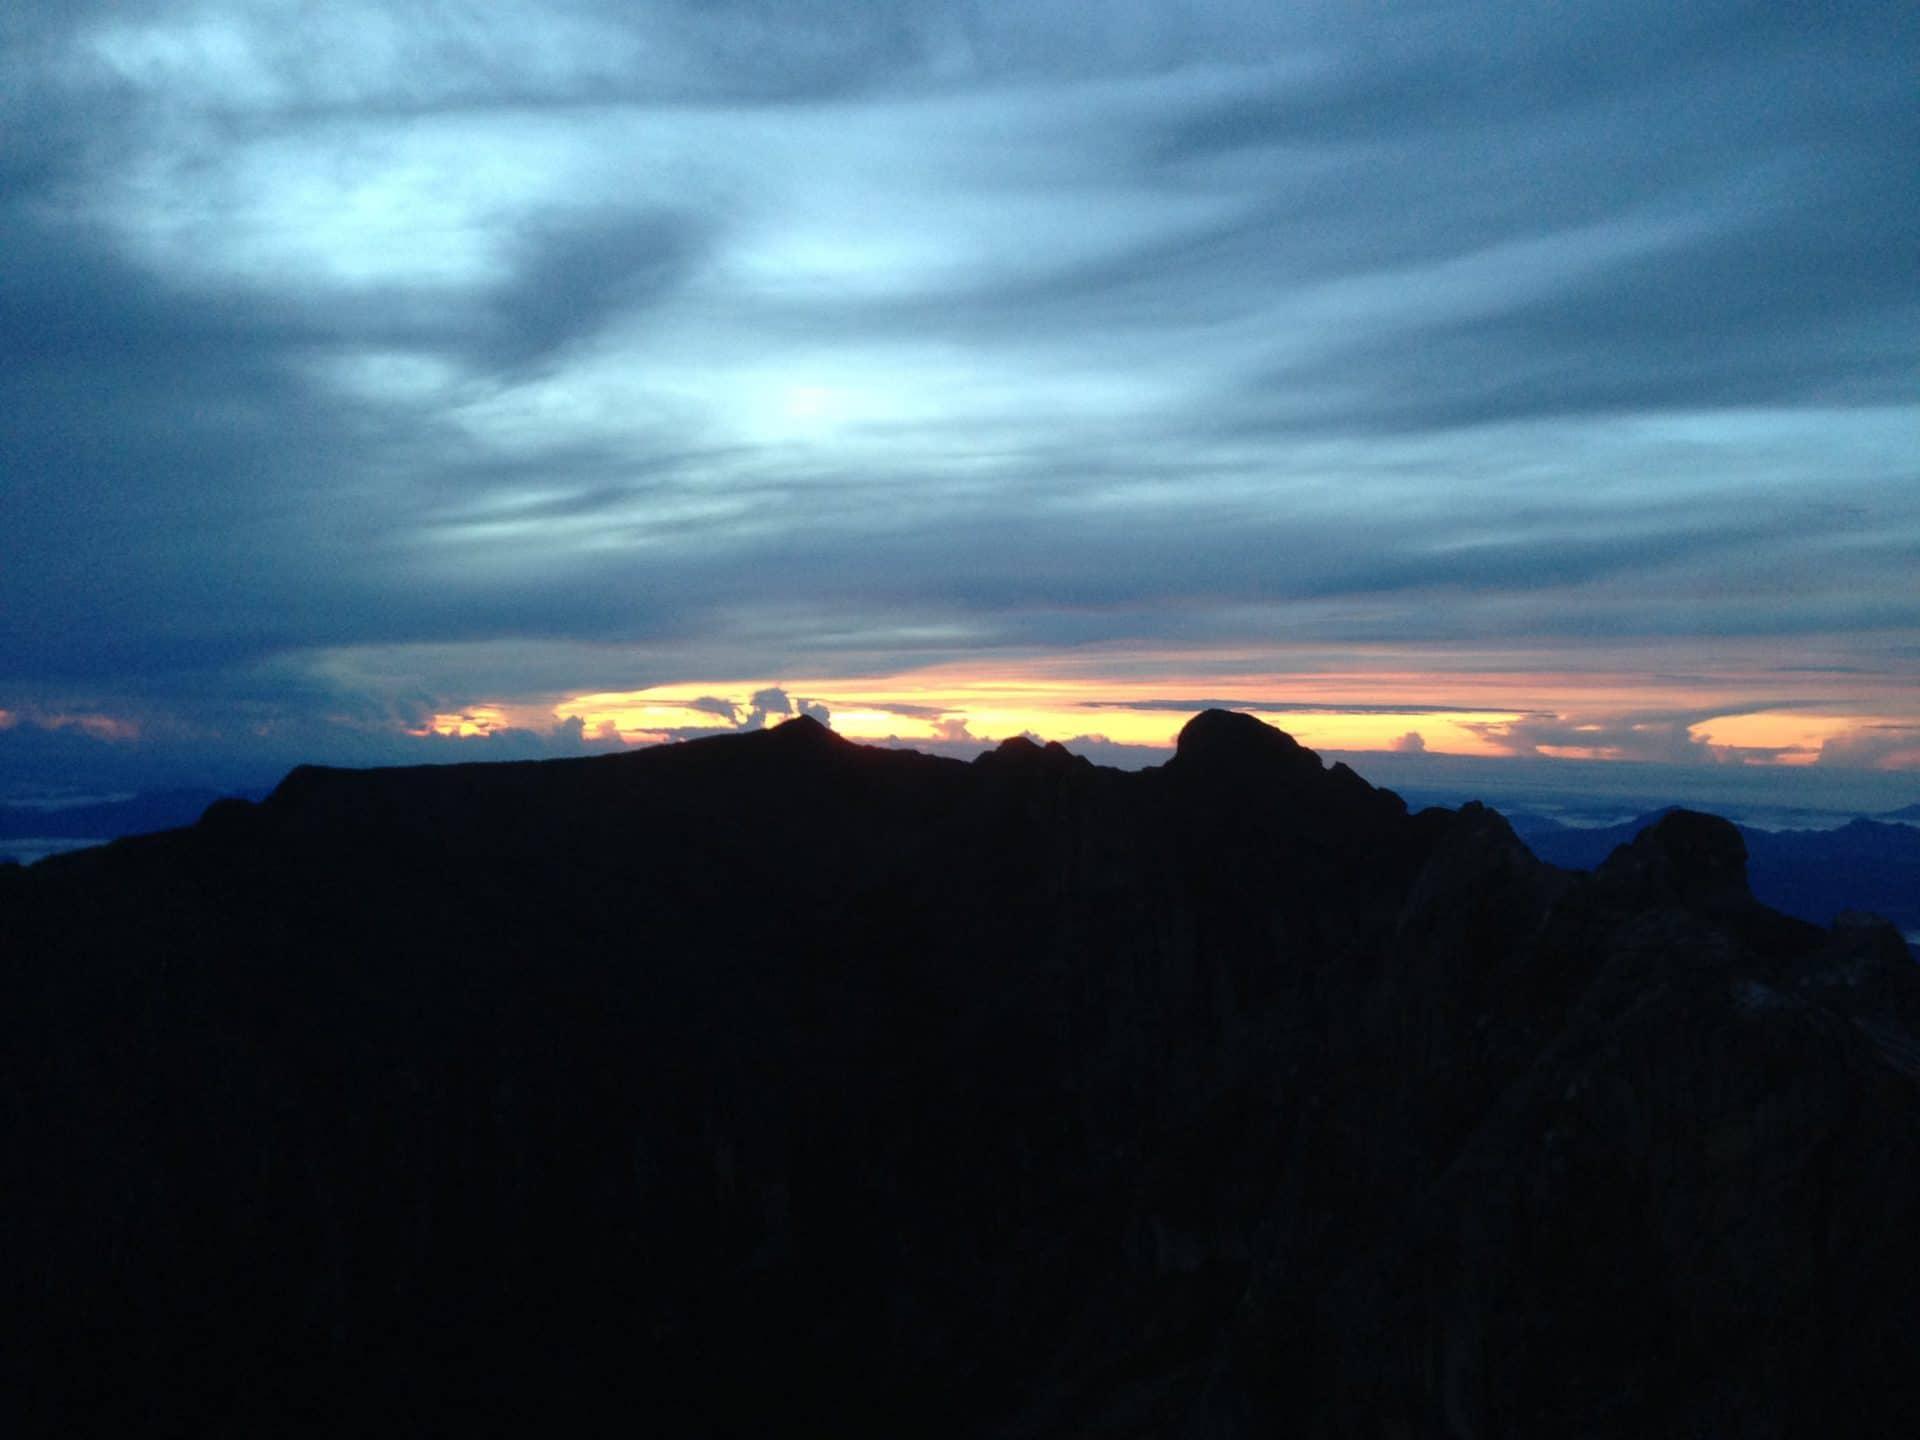 malaisie-borneo-mont-kinabalu-sommet-goyav